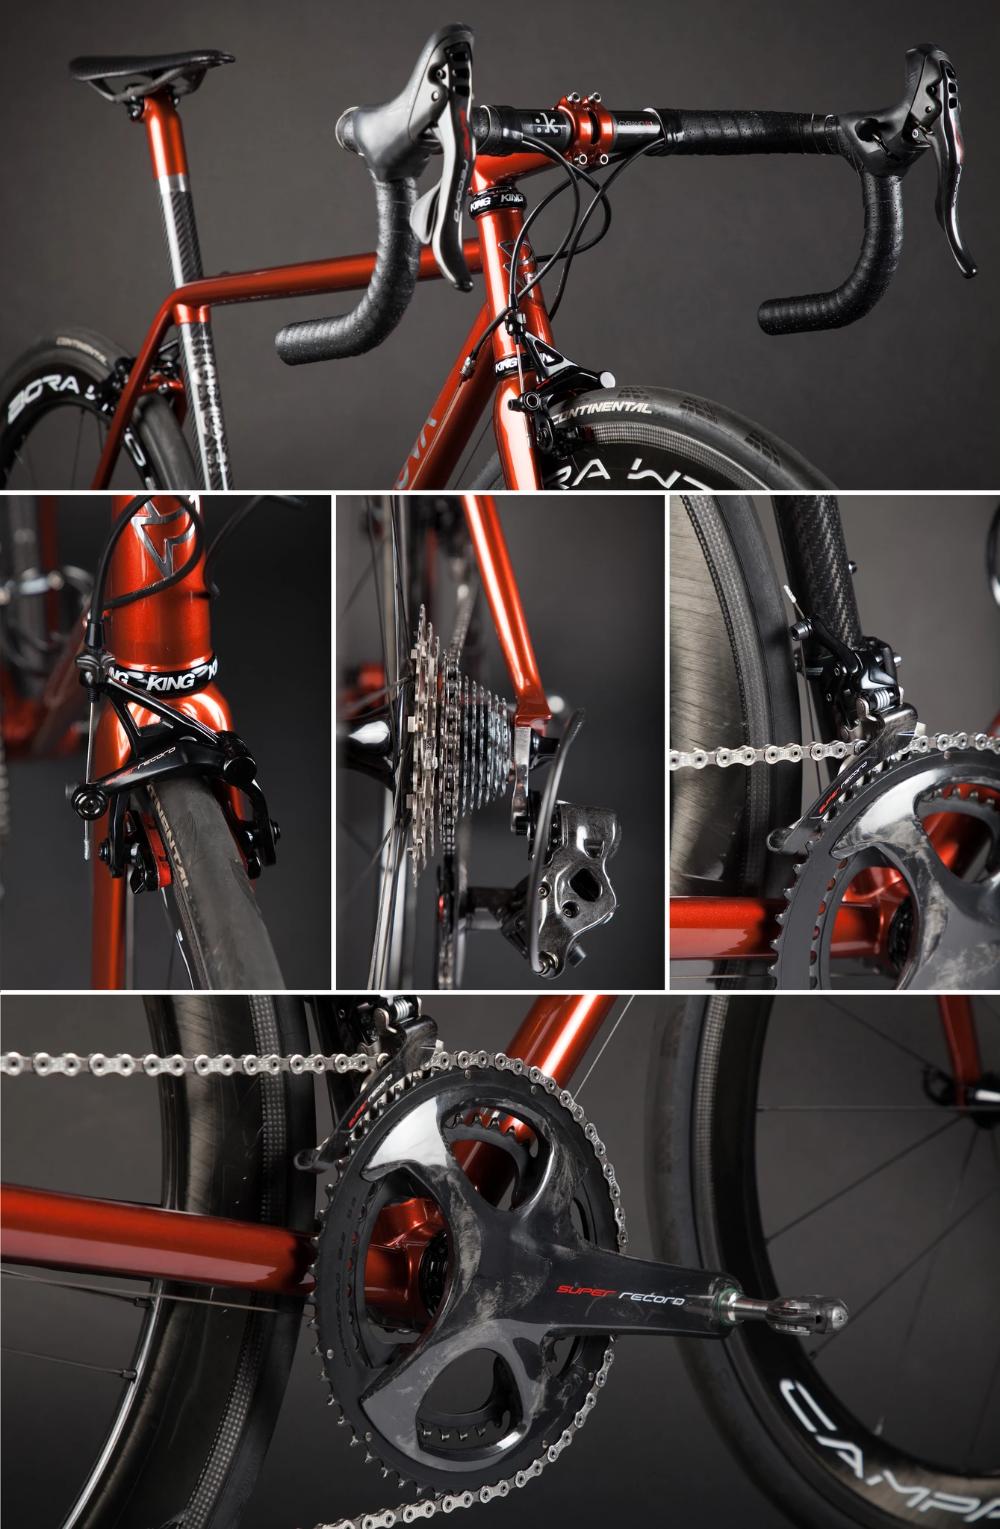 Chad S Prova Speciale Bike Brands Bike Cycling